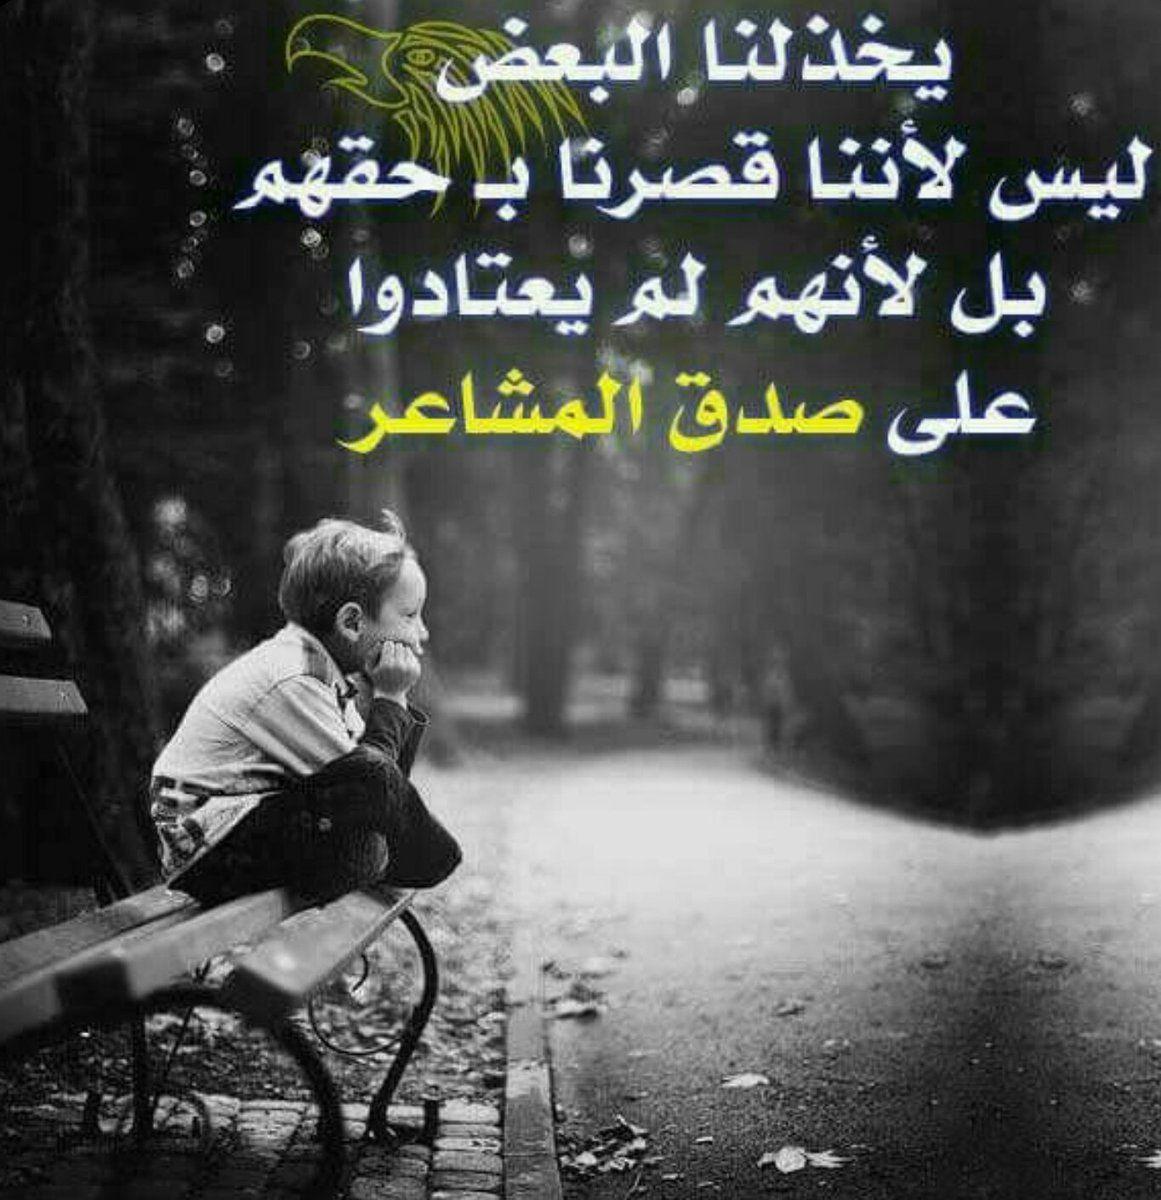 صور عن الخداع Deception بوستات عن الكذب والخداع Arabic Quotes Funny Quotes Life Quotes